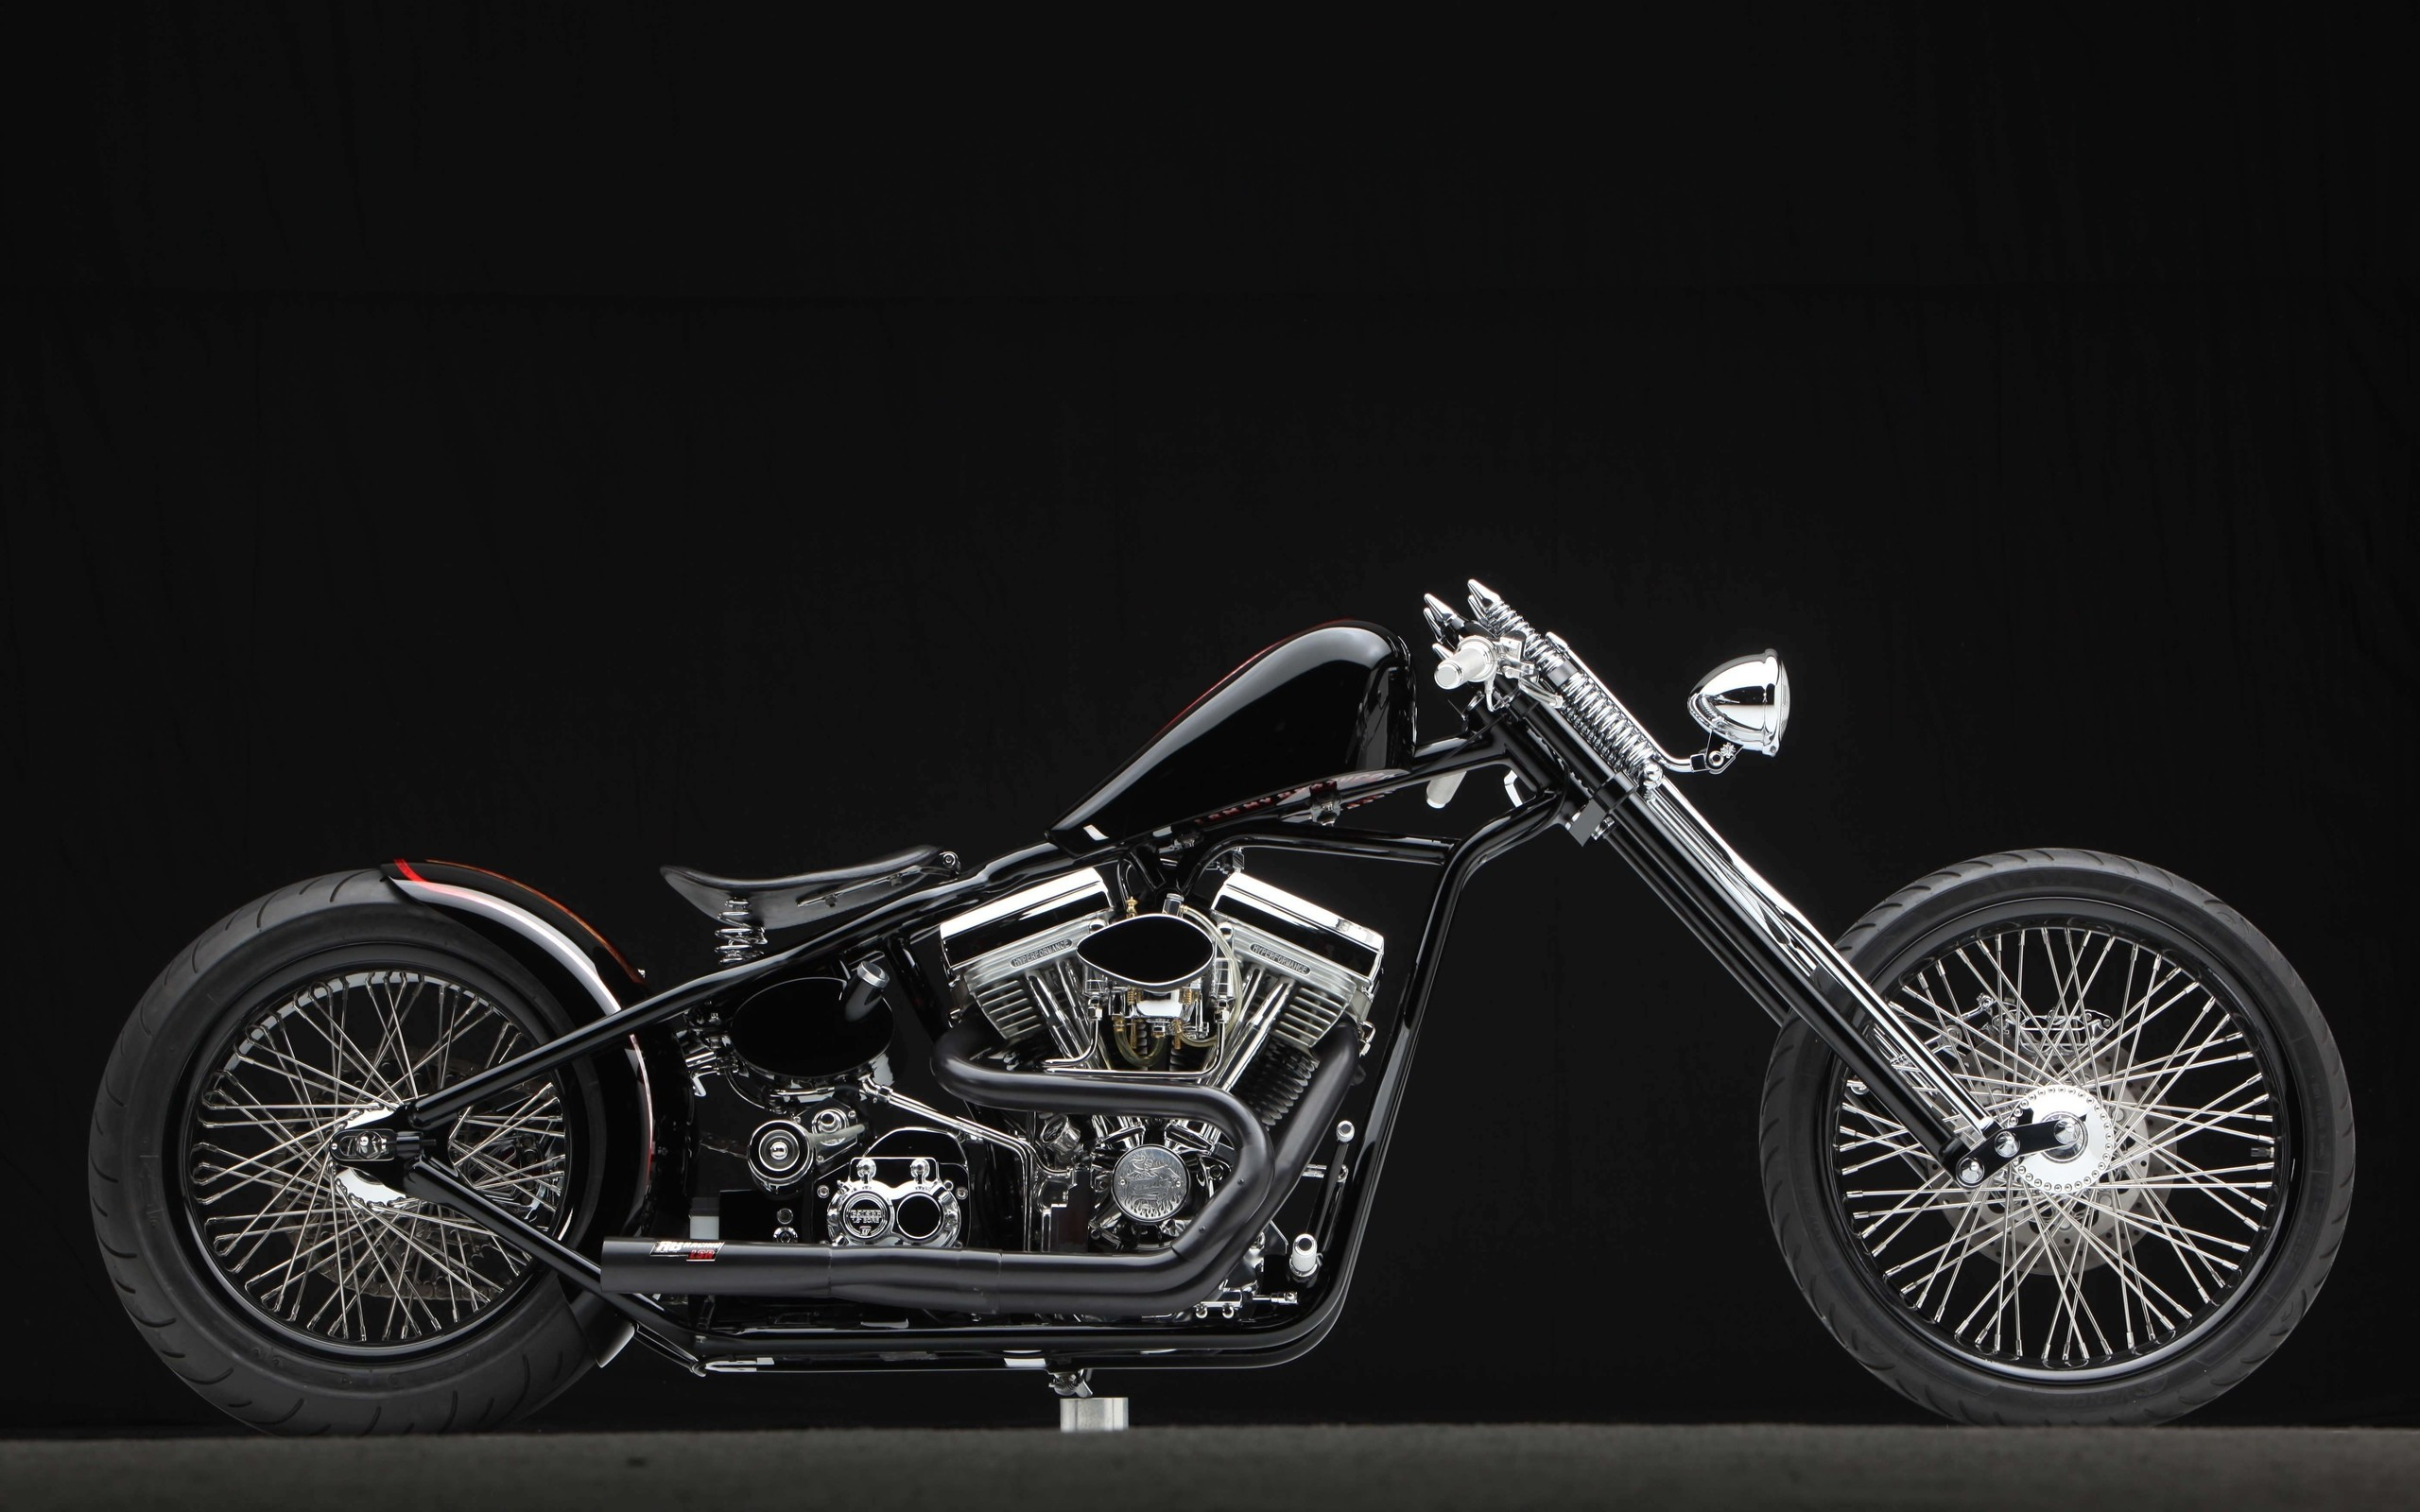 bobber motorcycle wallpaper 62 images